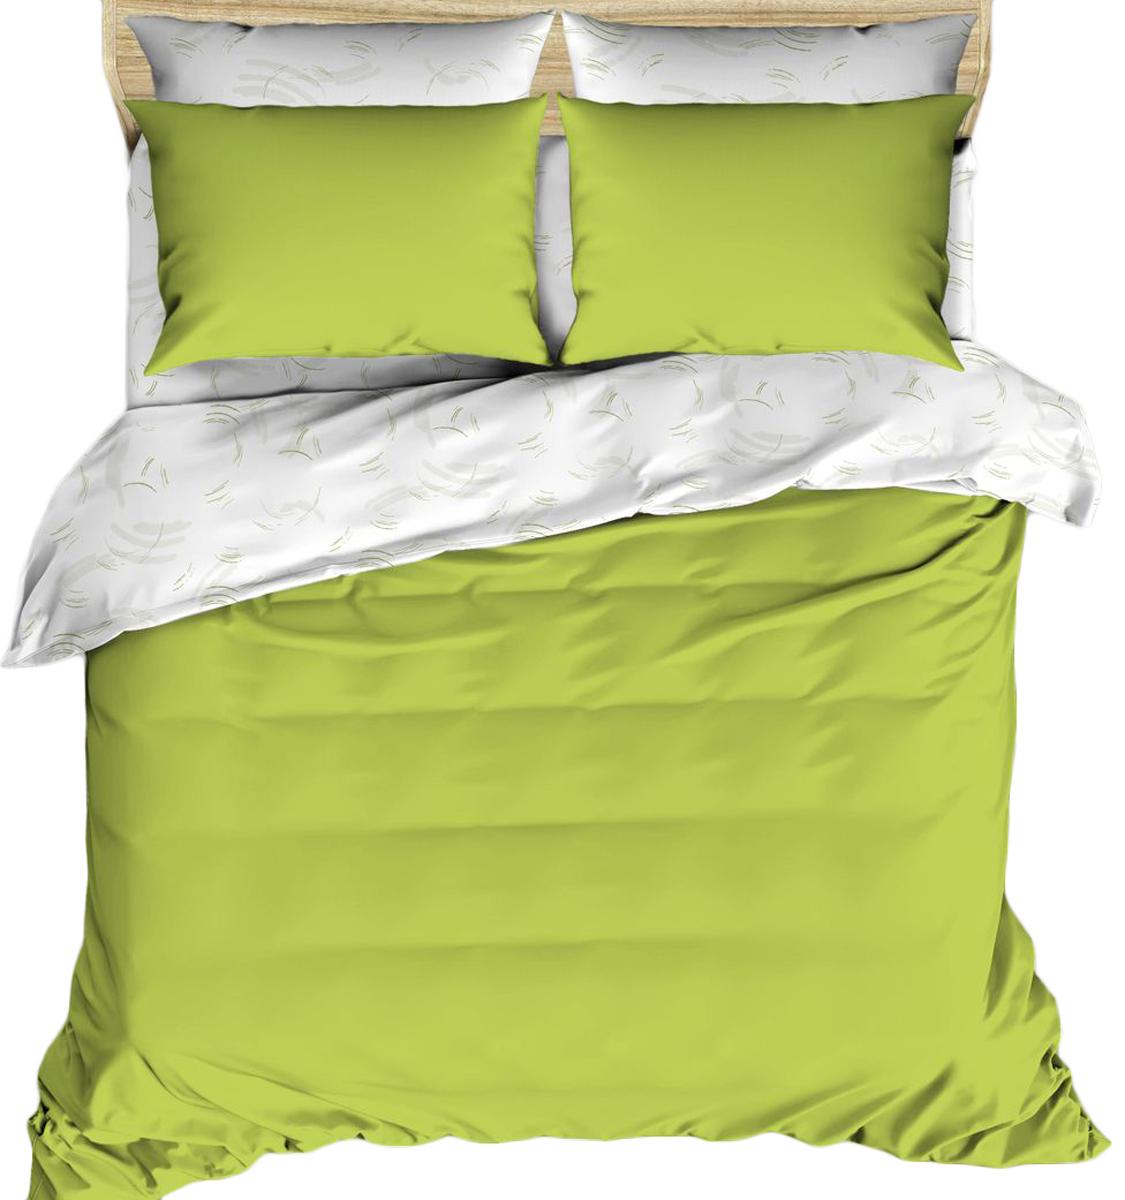 Комплект постельного белья Василиса Будто случайно, евро, наволочки 70x70;50x70. 163546 комплекты белья rhs комплект белья